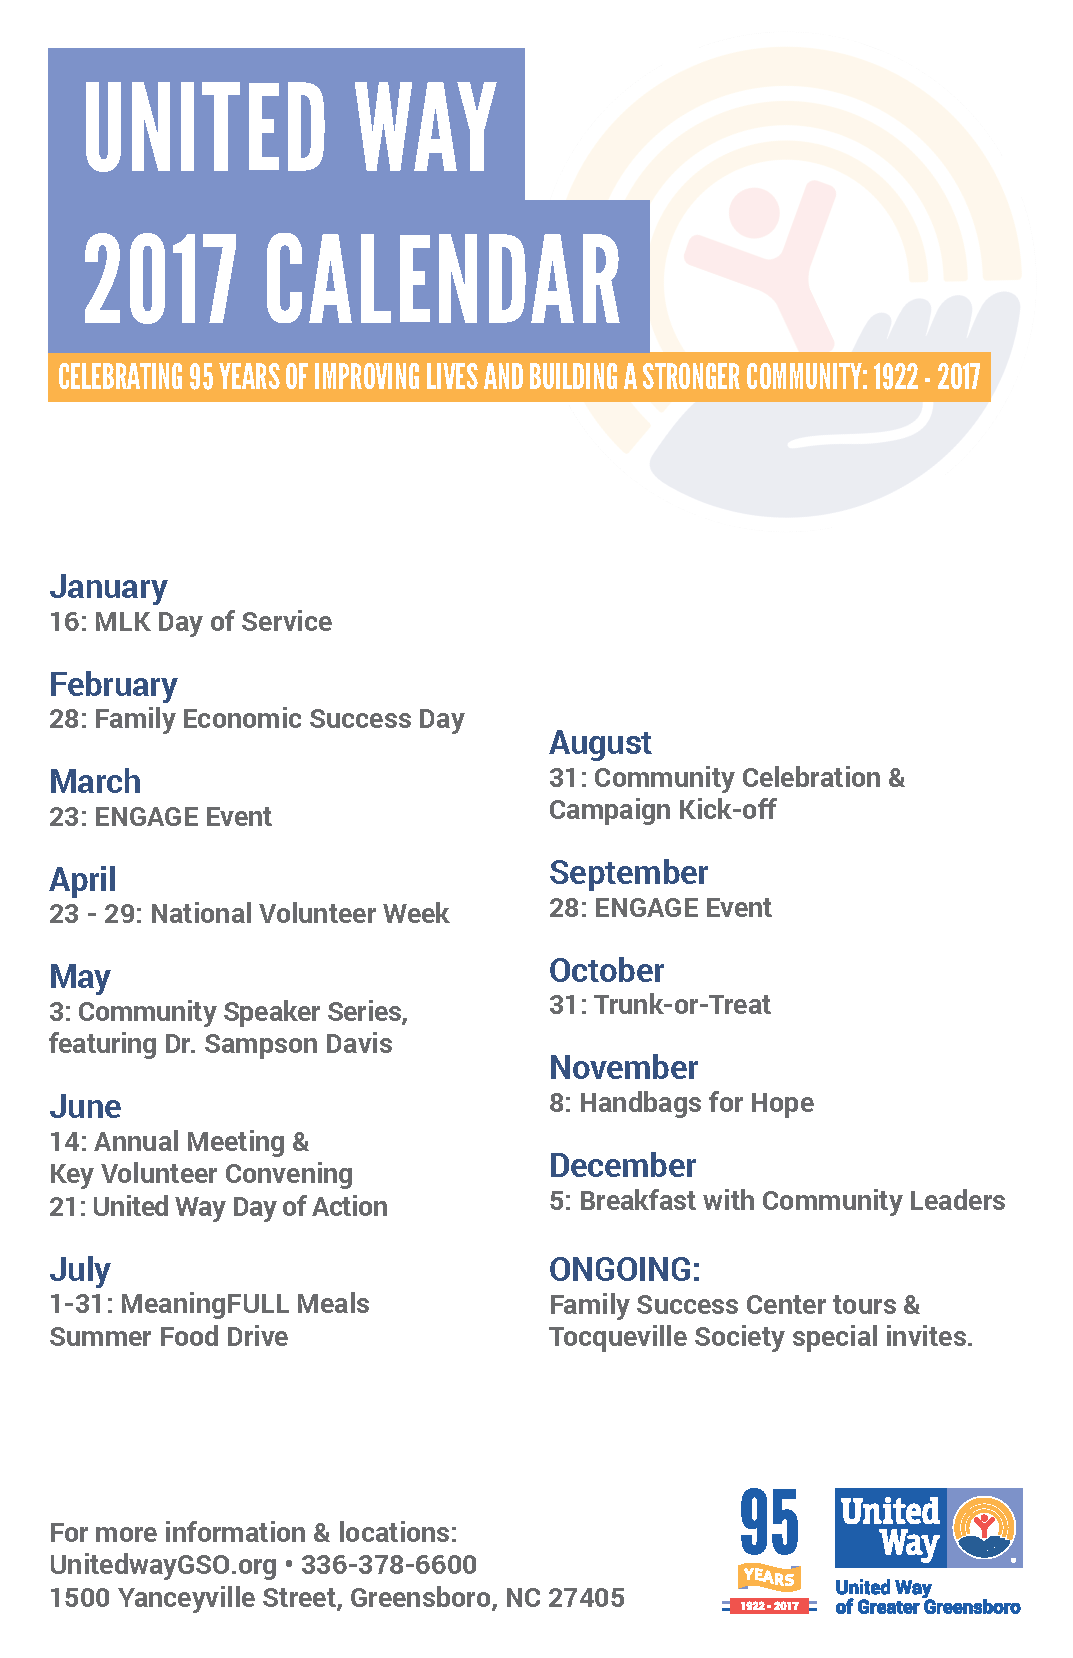 2017 United Way of Greater Greensboro Calendar